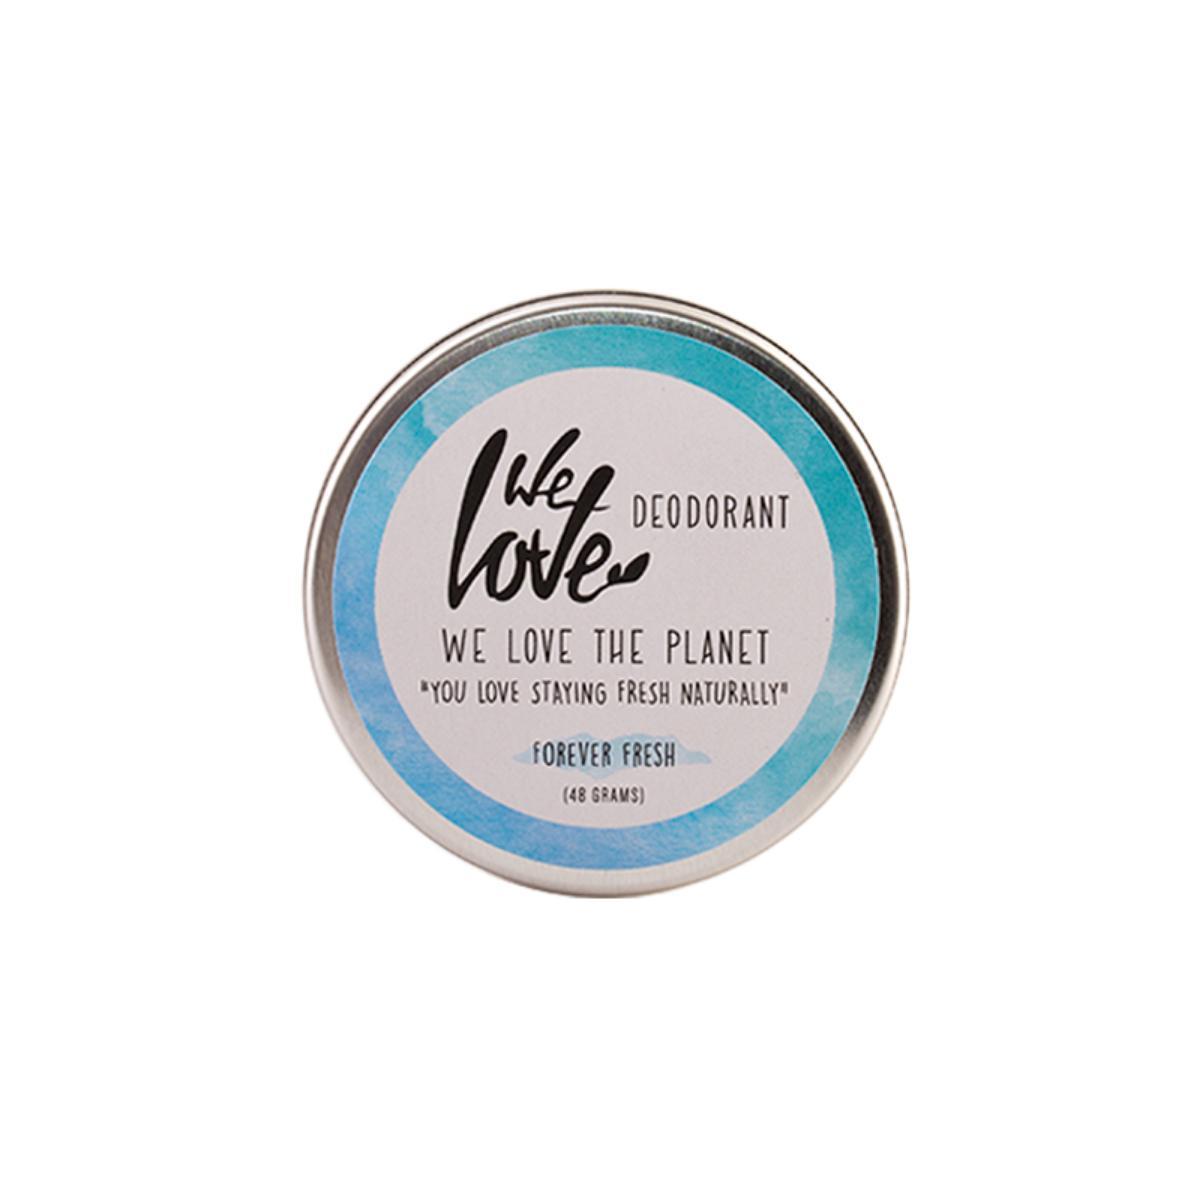 We Love The Planet Přírodní krémový deodorant, Forever Fresh 48 g